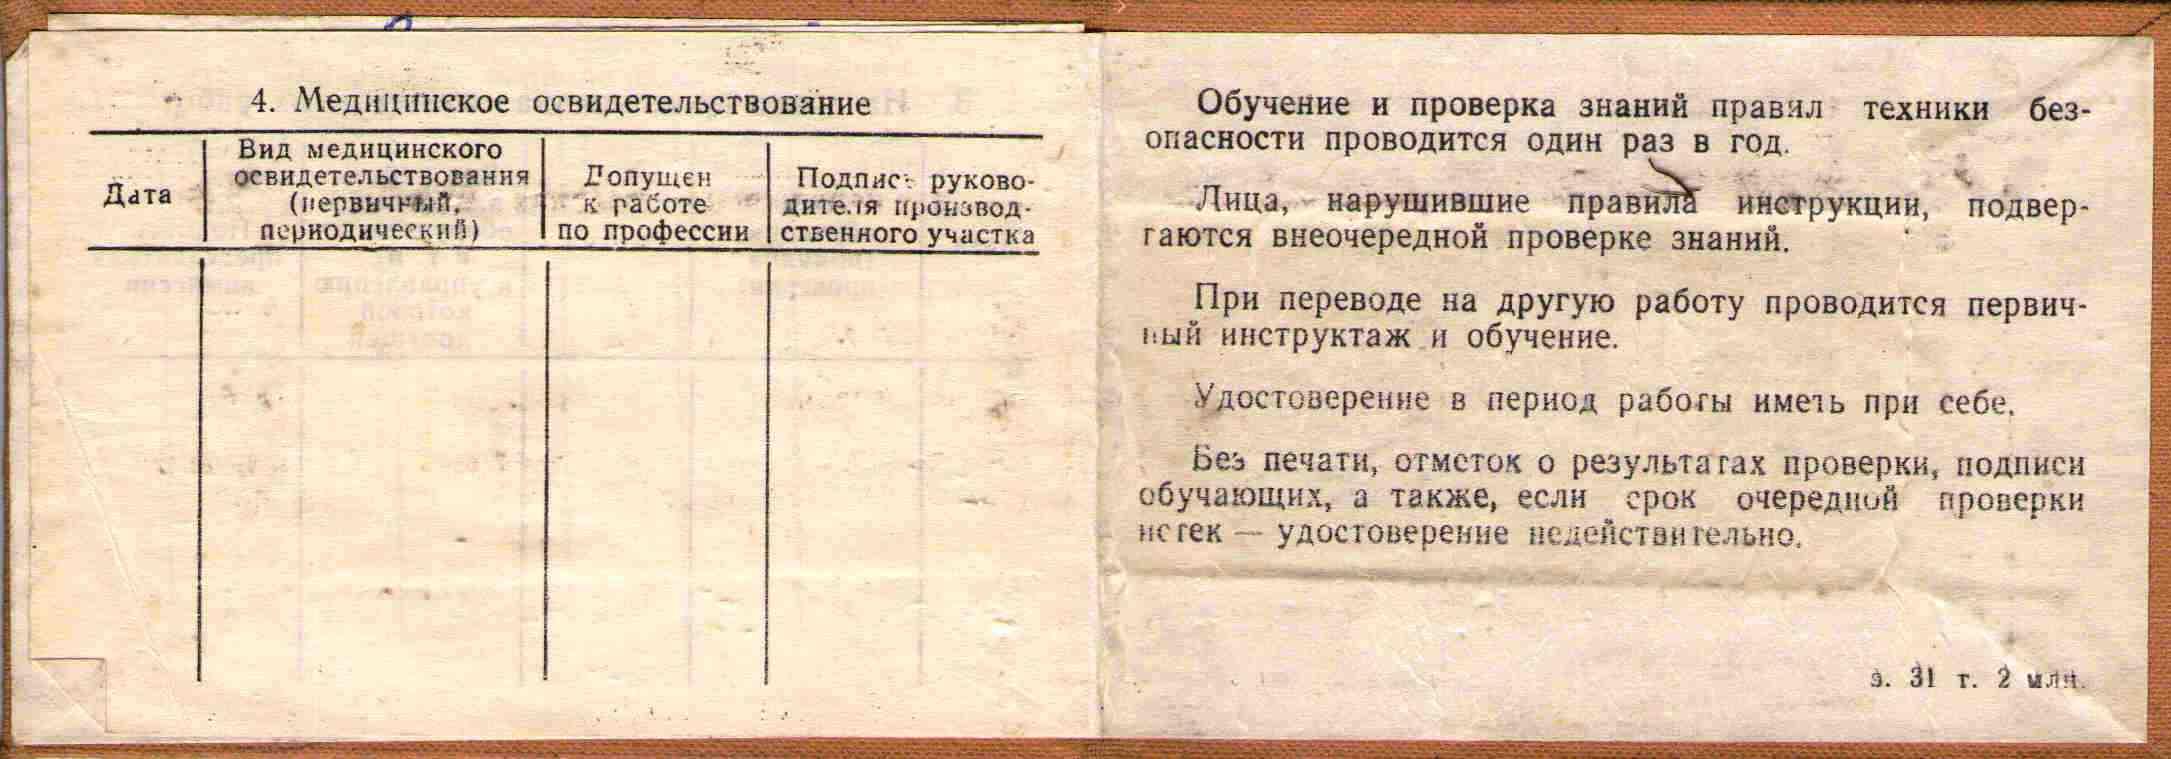 76. Удостоверение о проверке знаний по технике безопасности, 1985